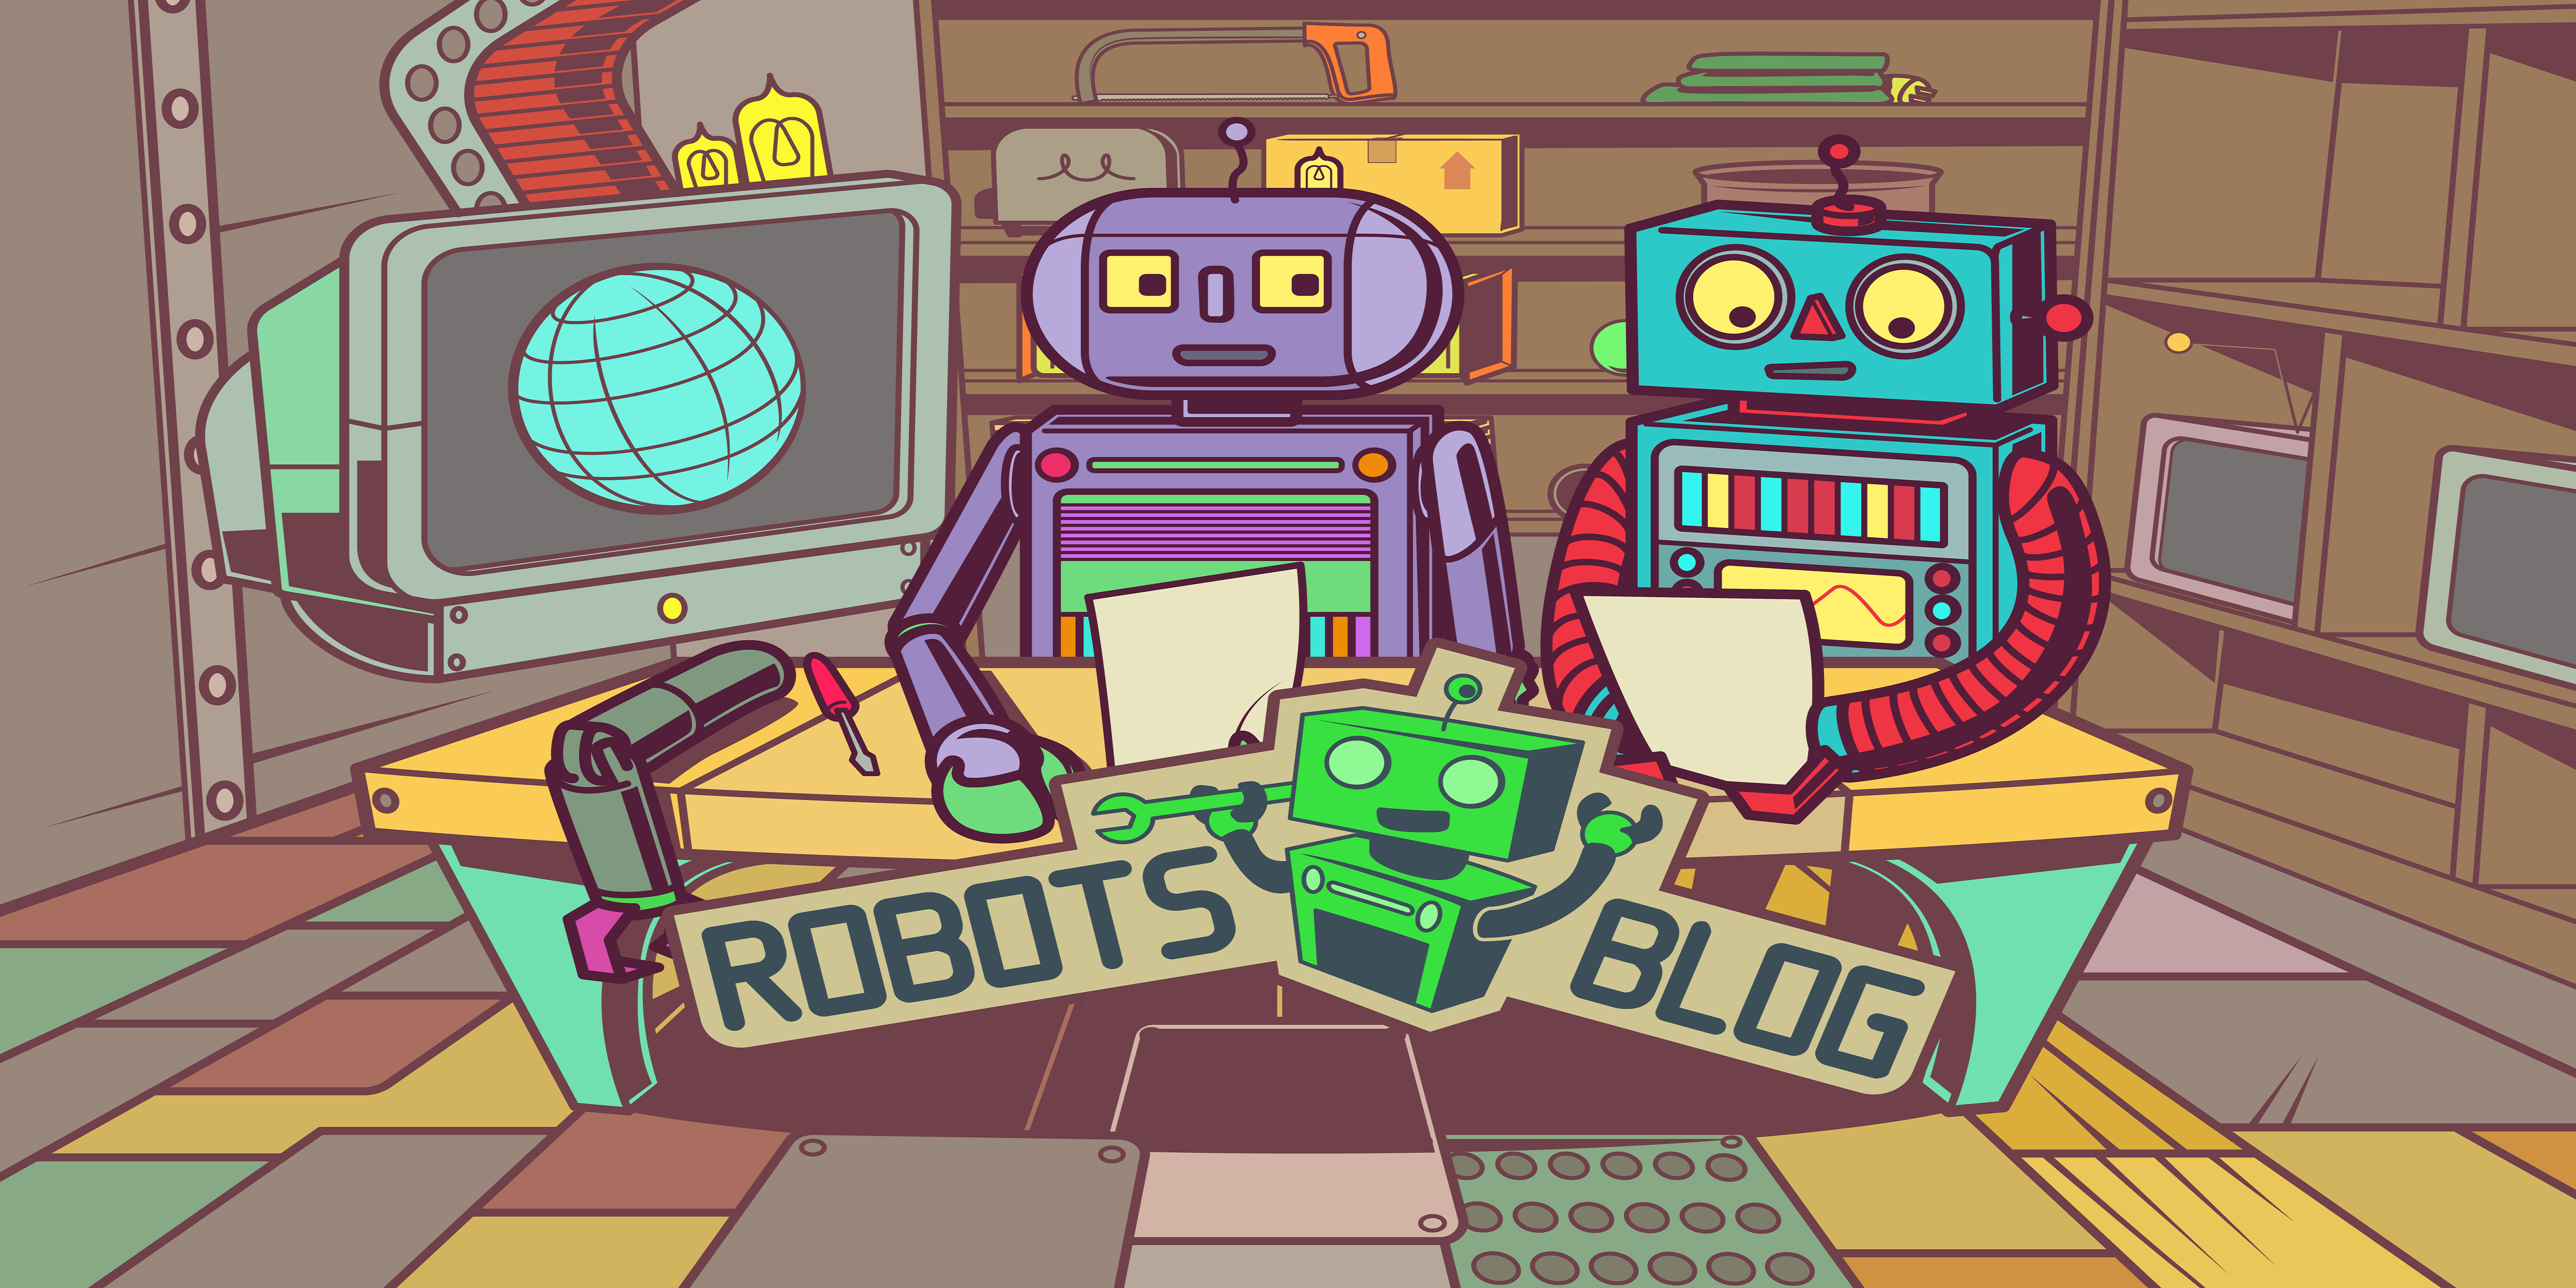 Robots Blog News about robots and robotics